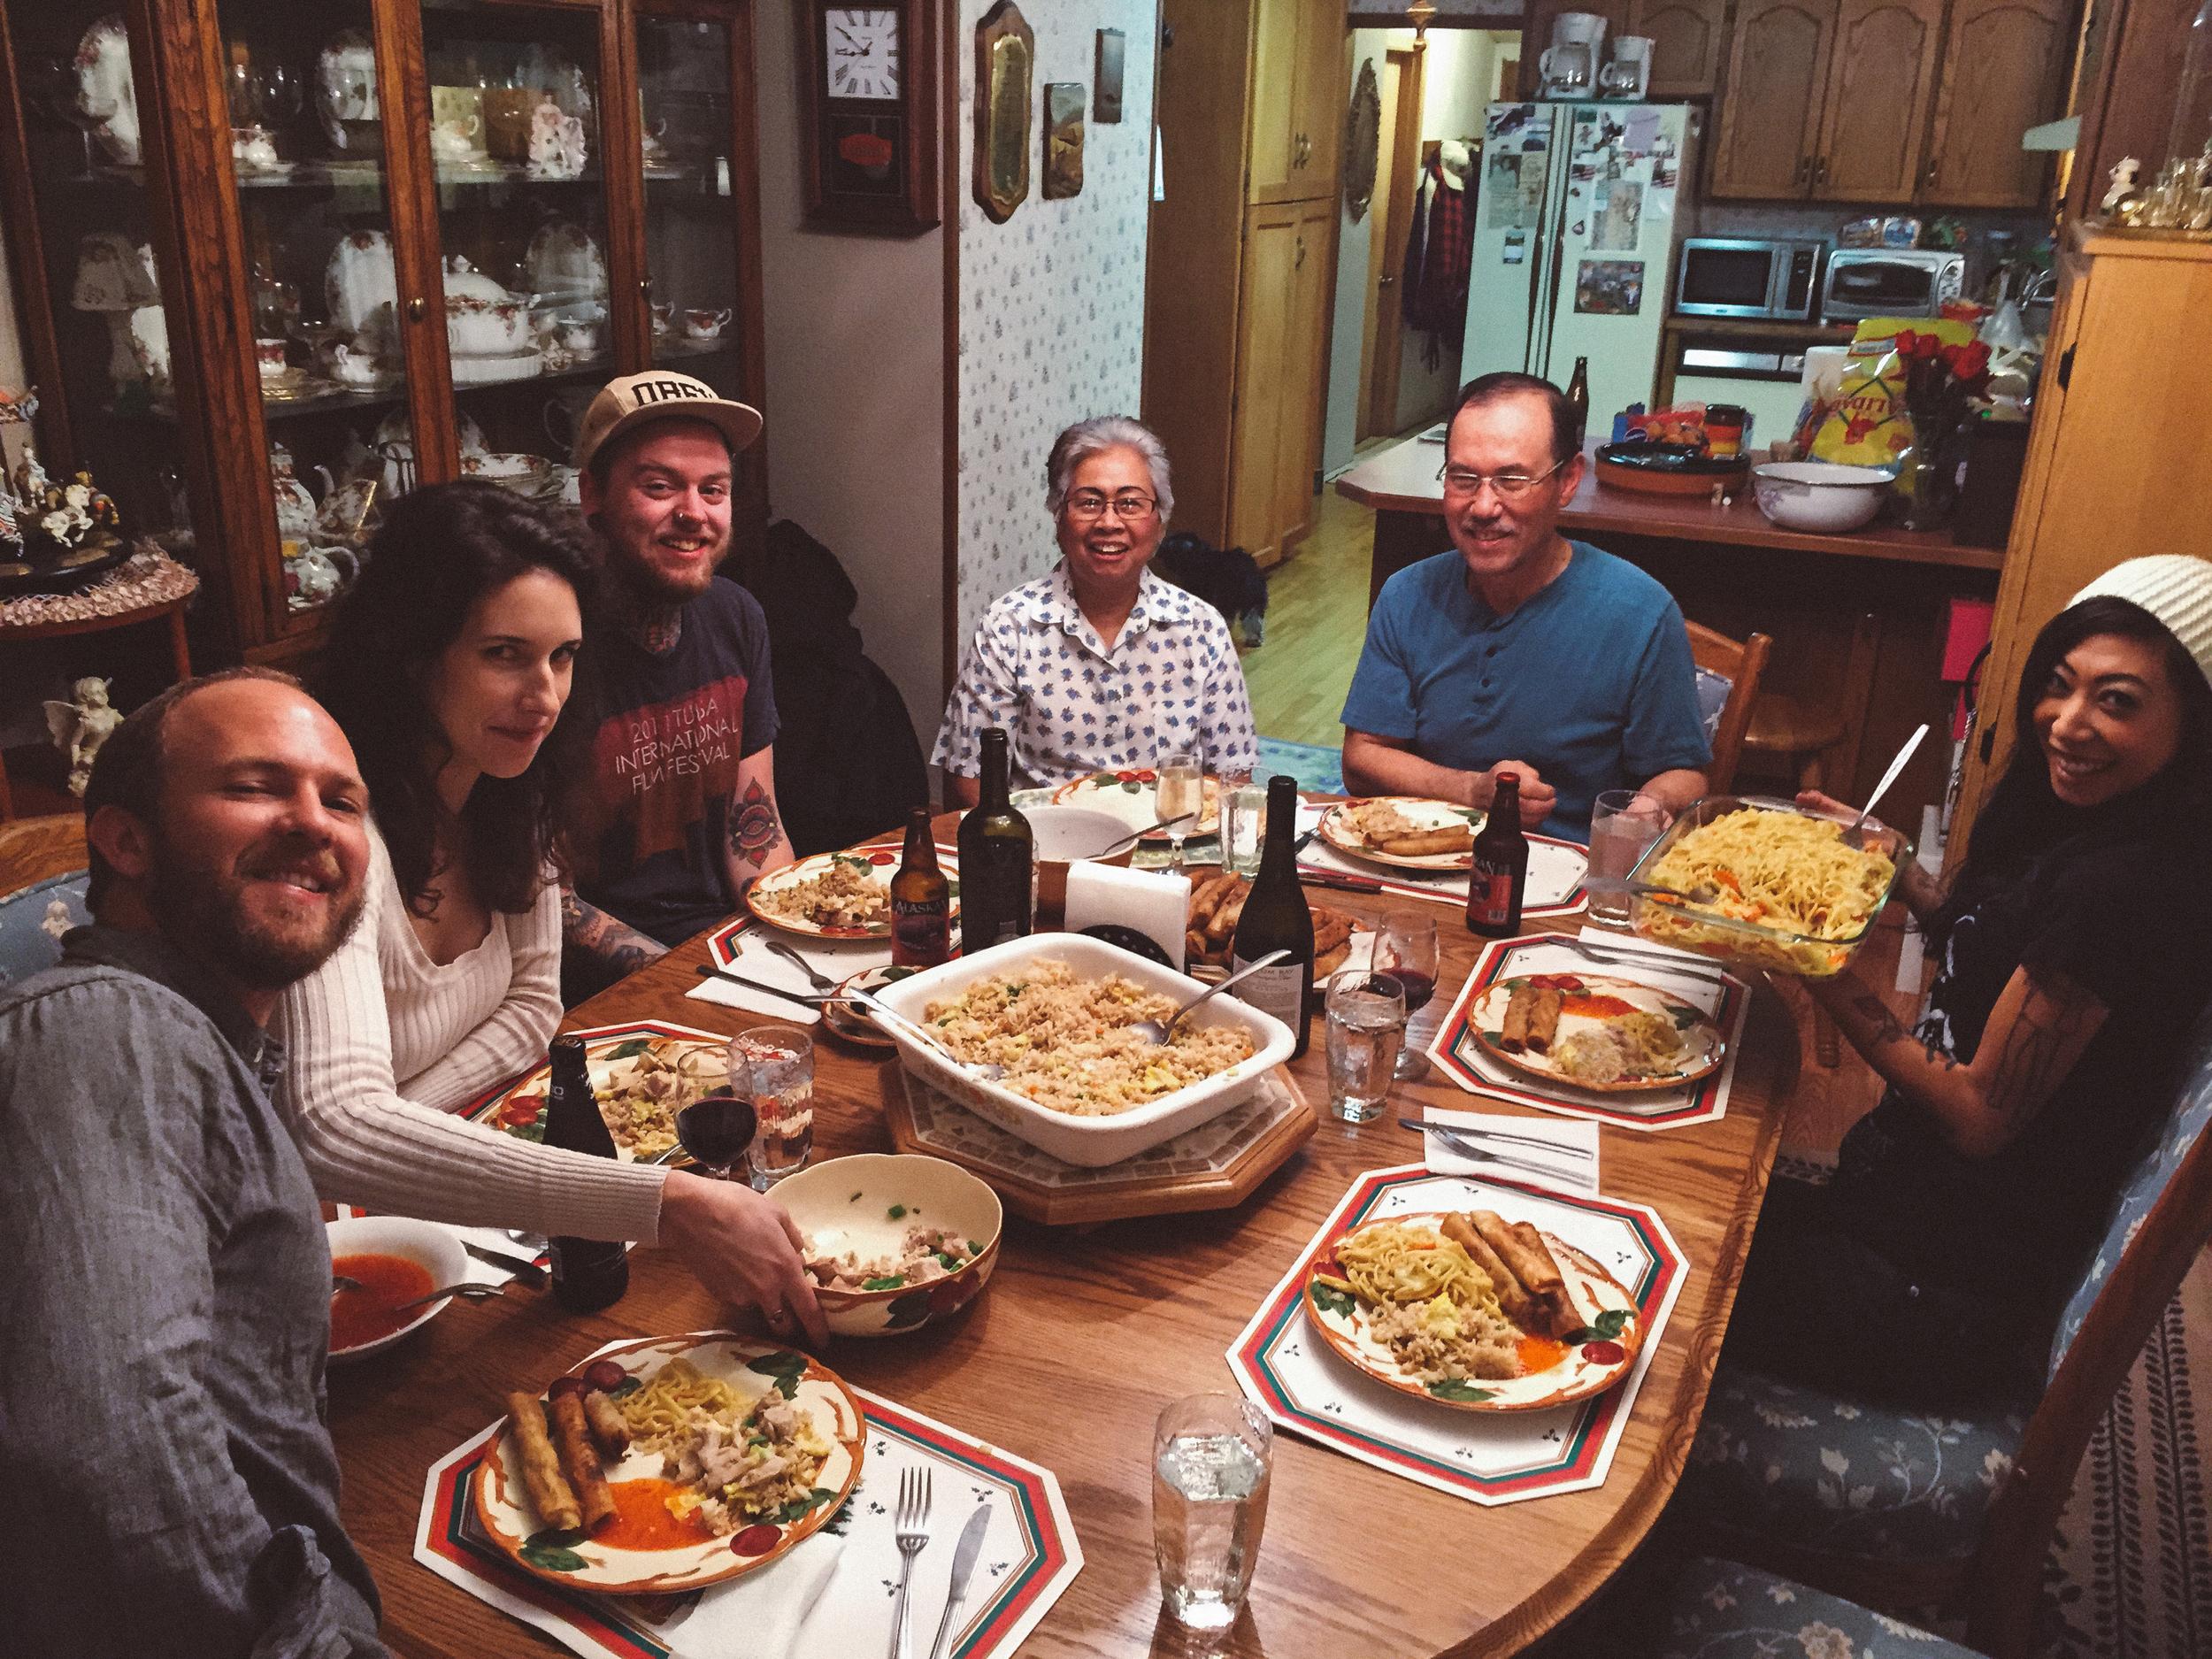 Family dinner. Left to right: Liam, Lisa, Garrett, Nina, Dwayne, Kristen. Sumas, Washington.